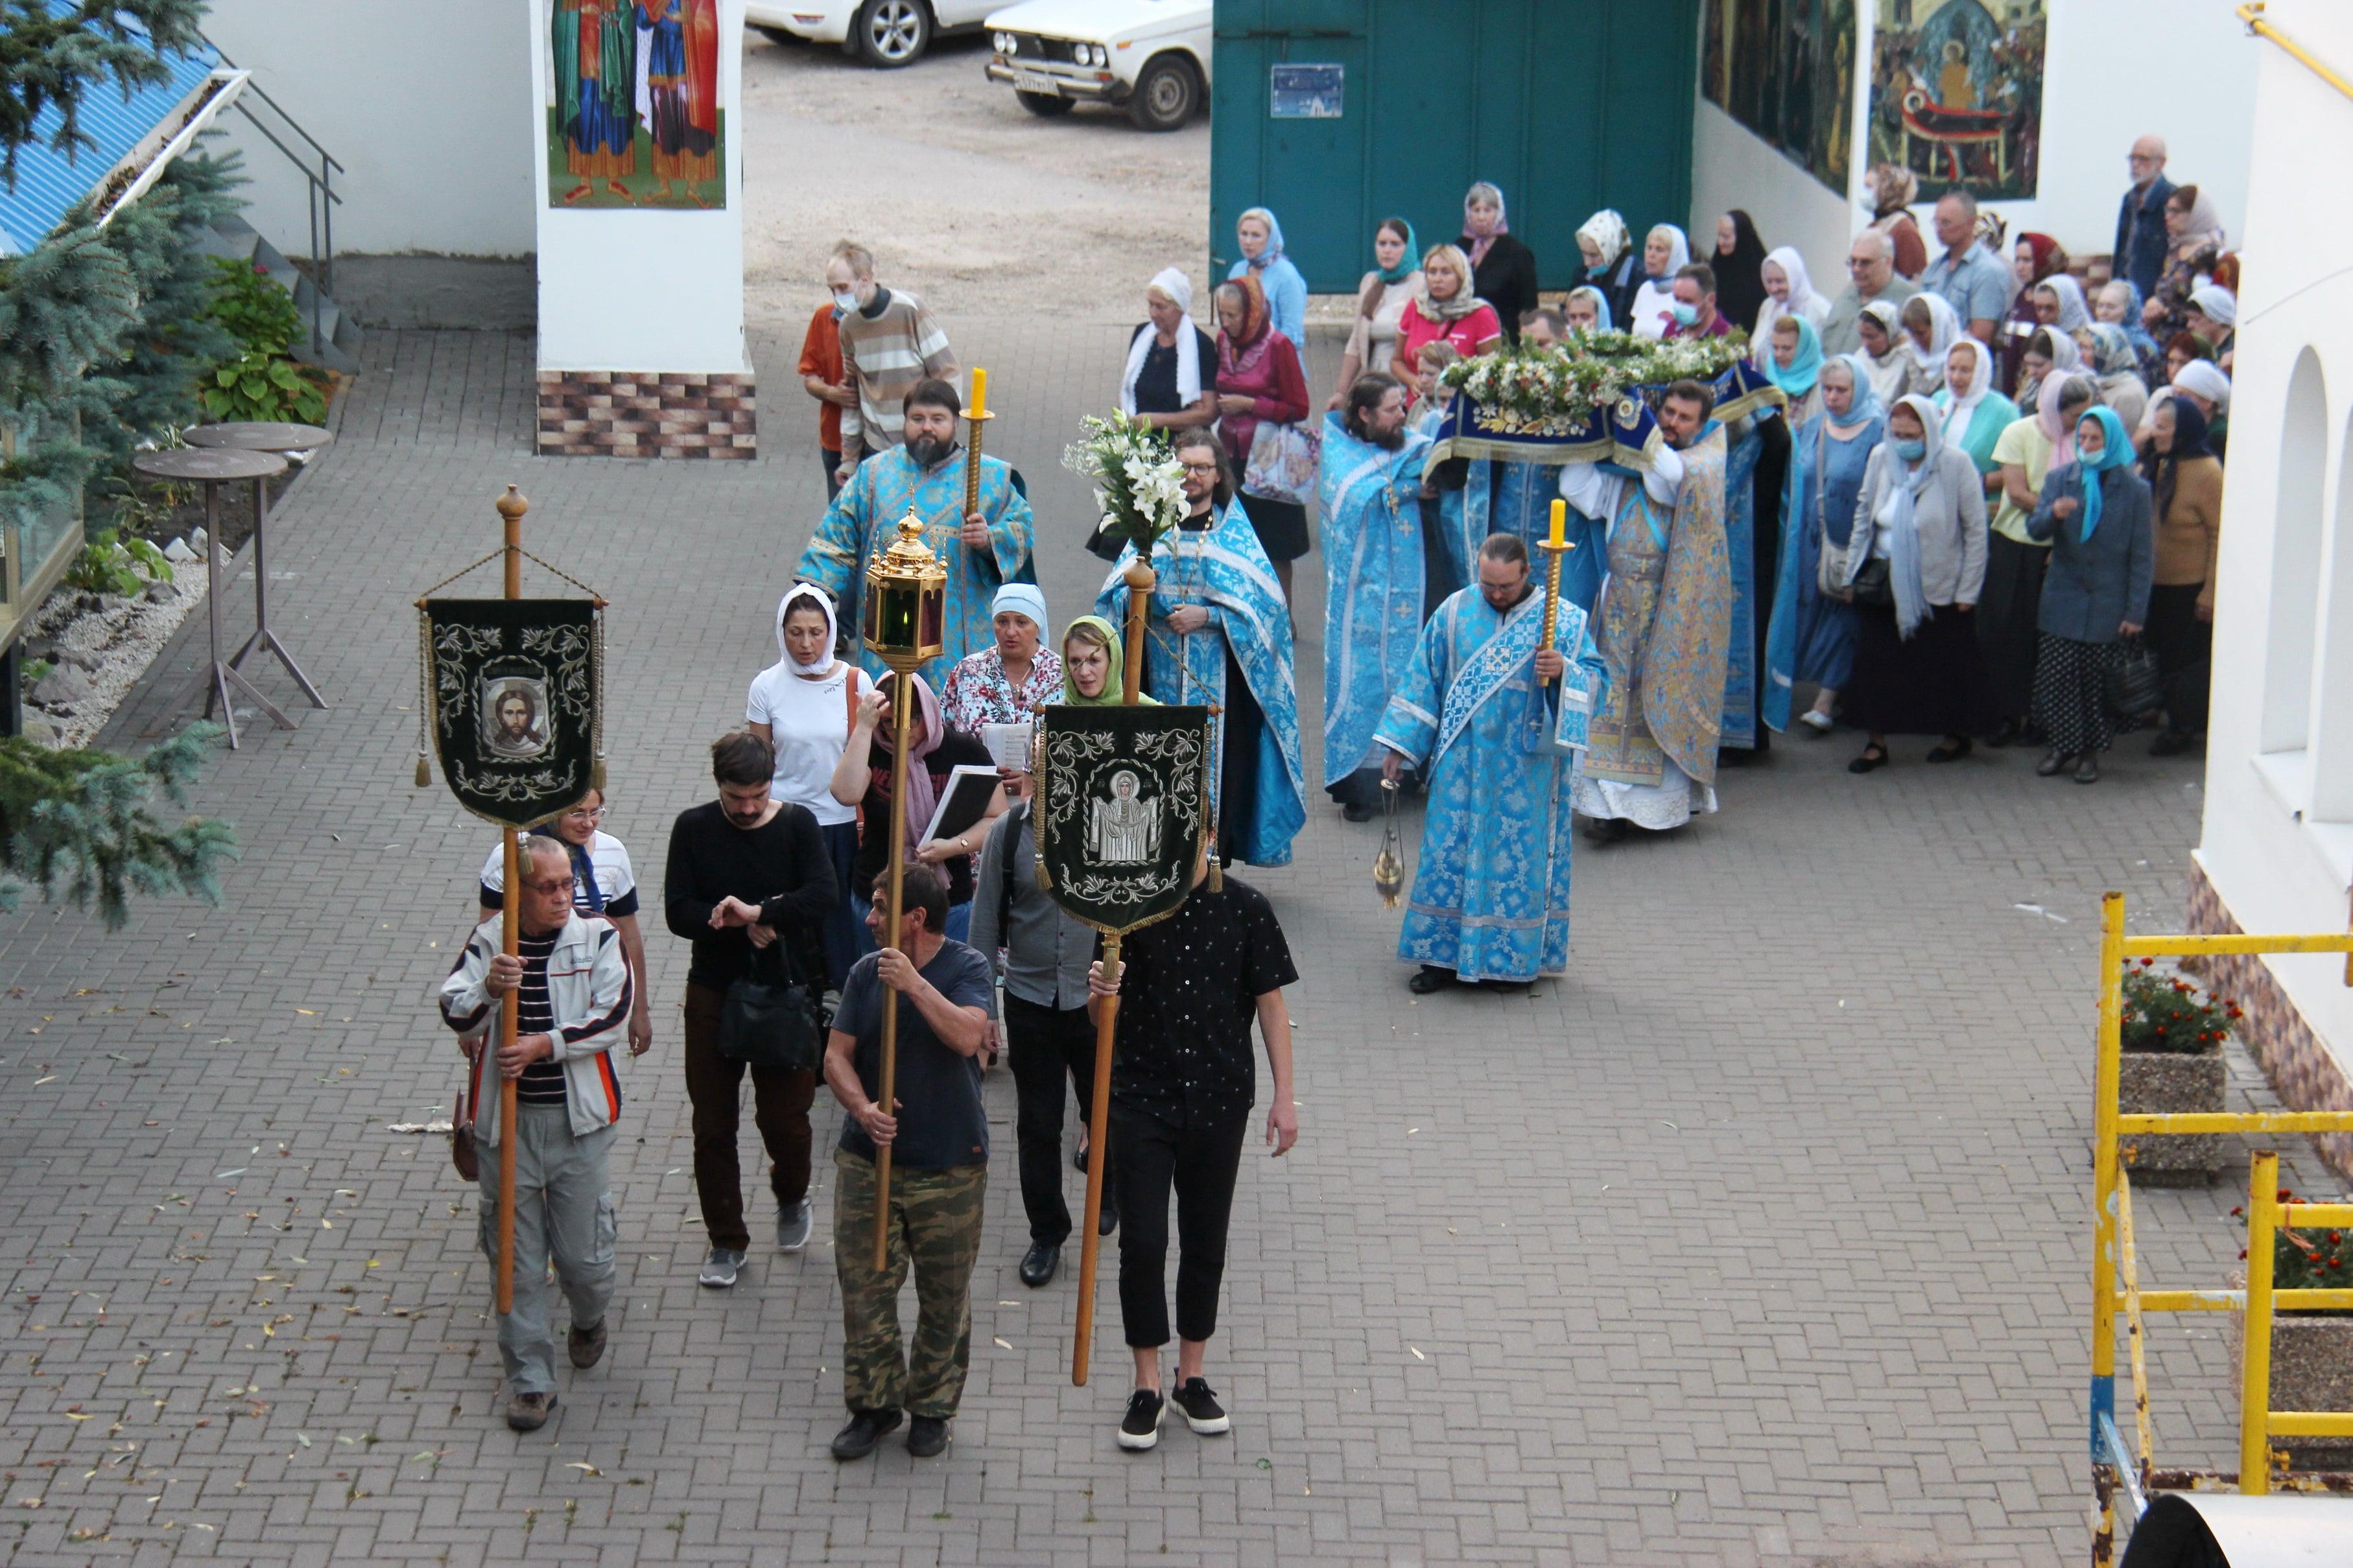 http://monuspen.ru/photoreports/6f0c4c725067d7a10ae5e454c5e82g07.JPG